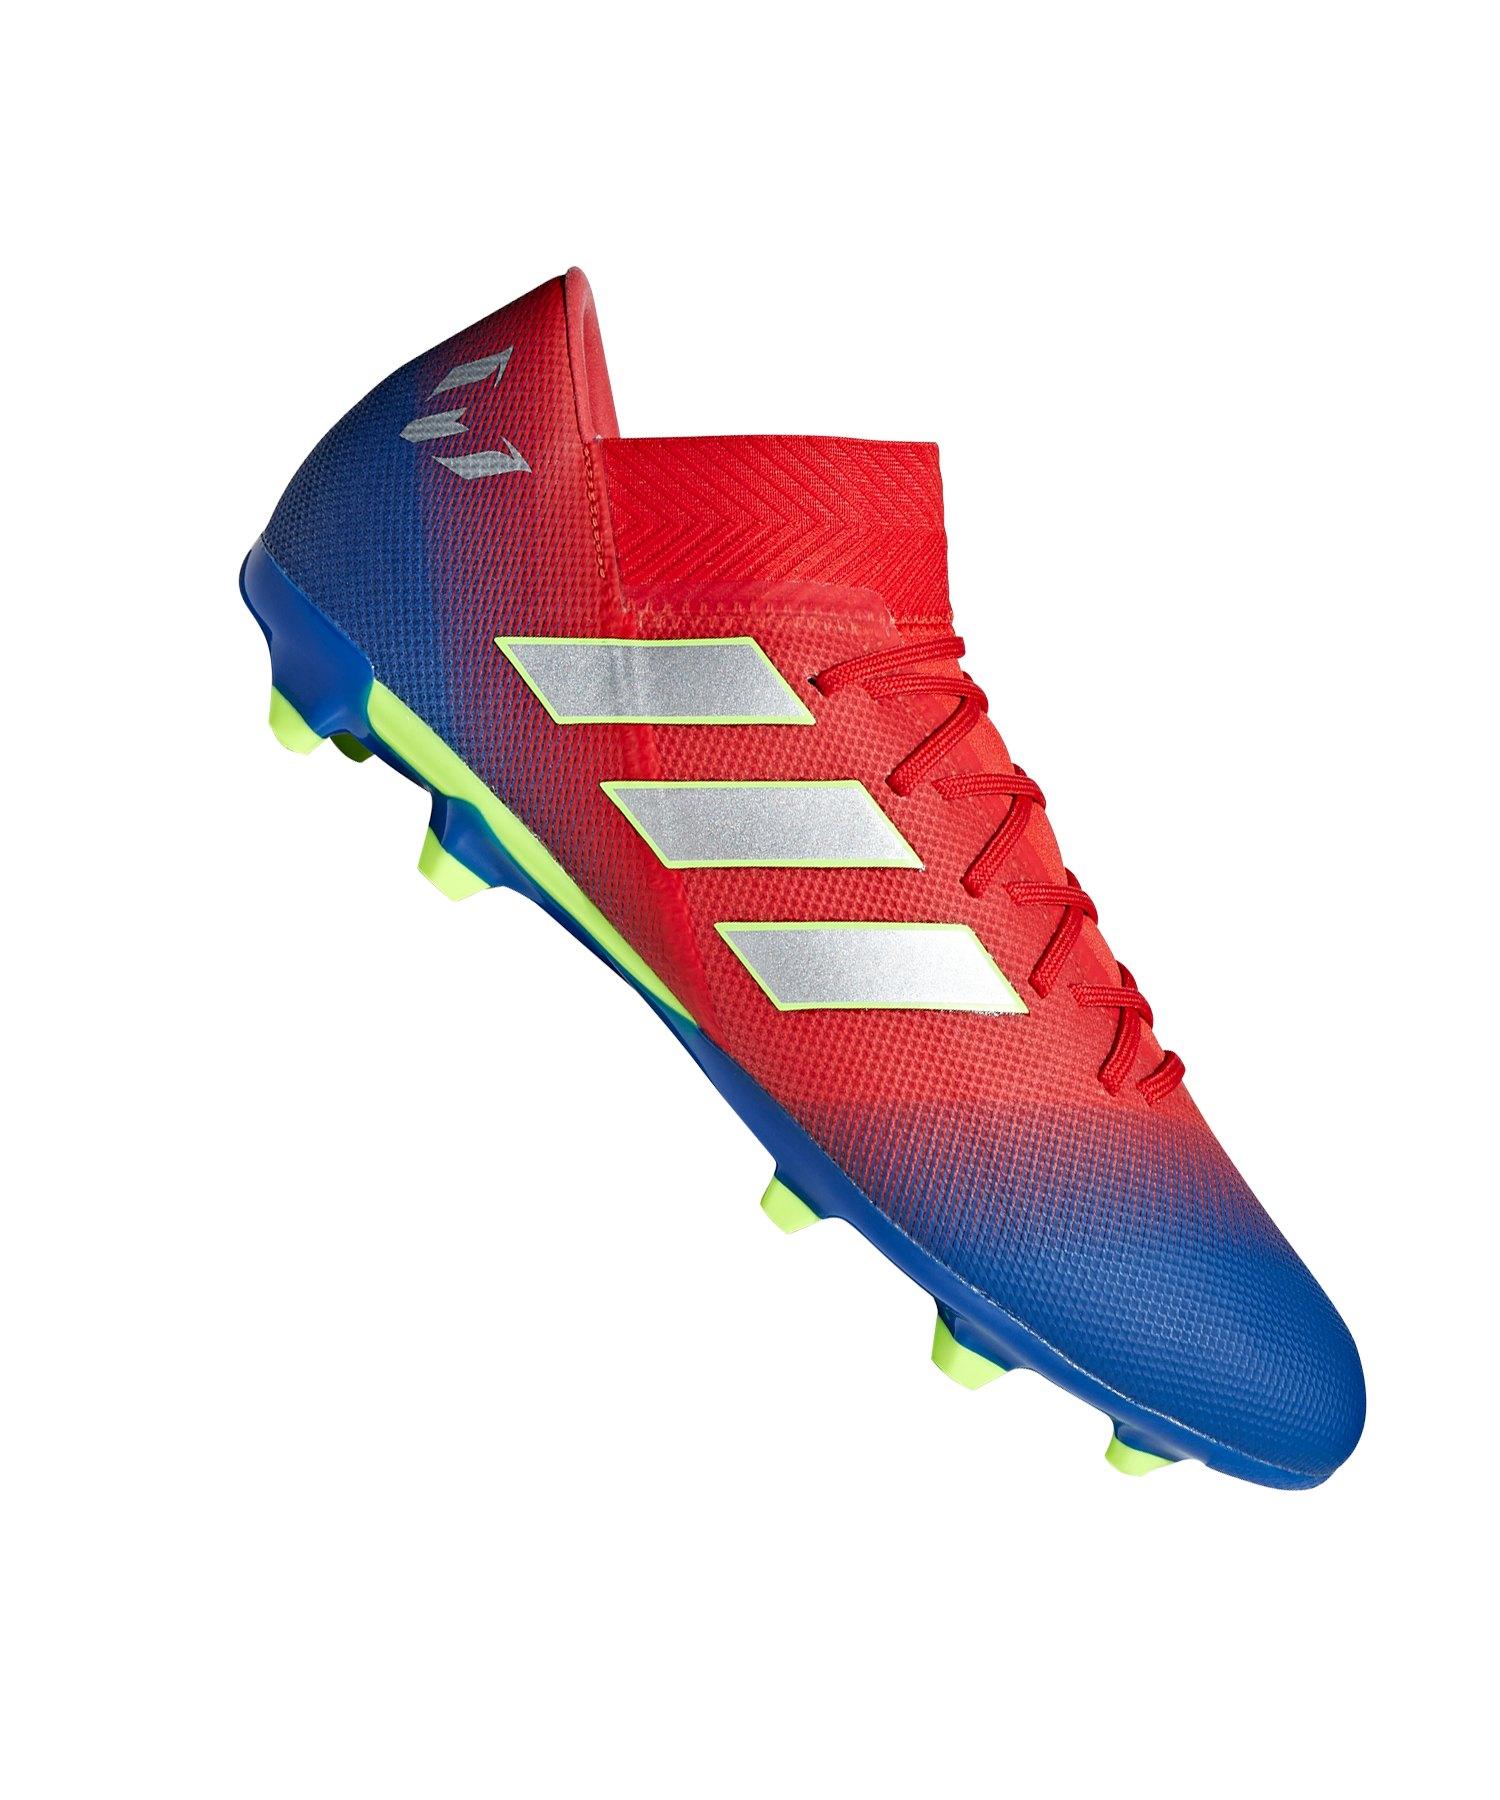 adidas NEMEZIZ Messi 18.3 FG Rot Blau - rot